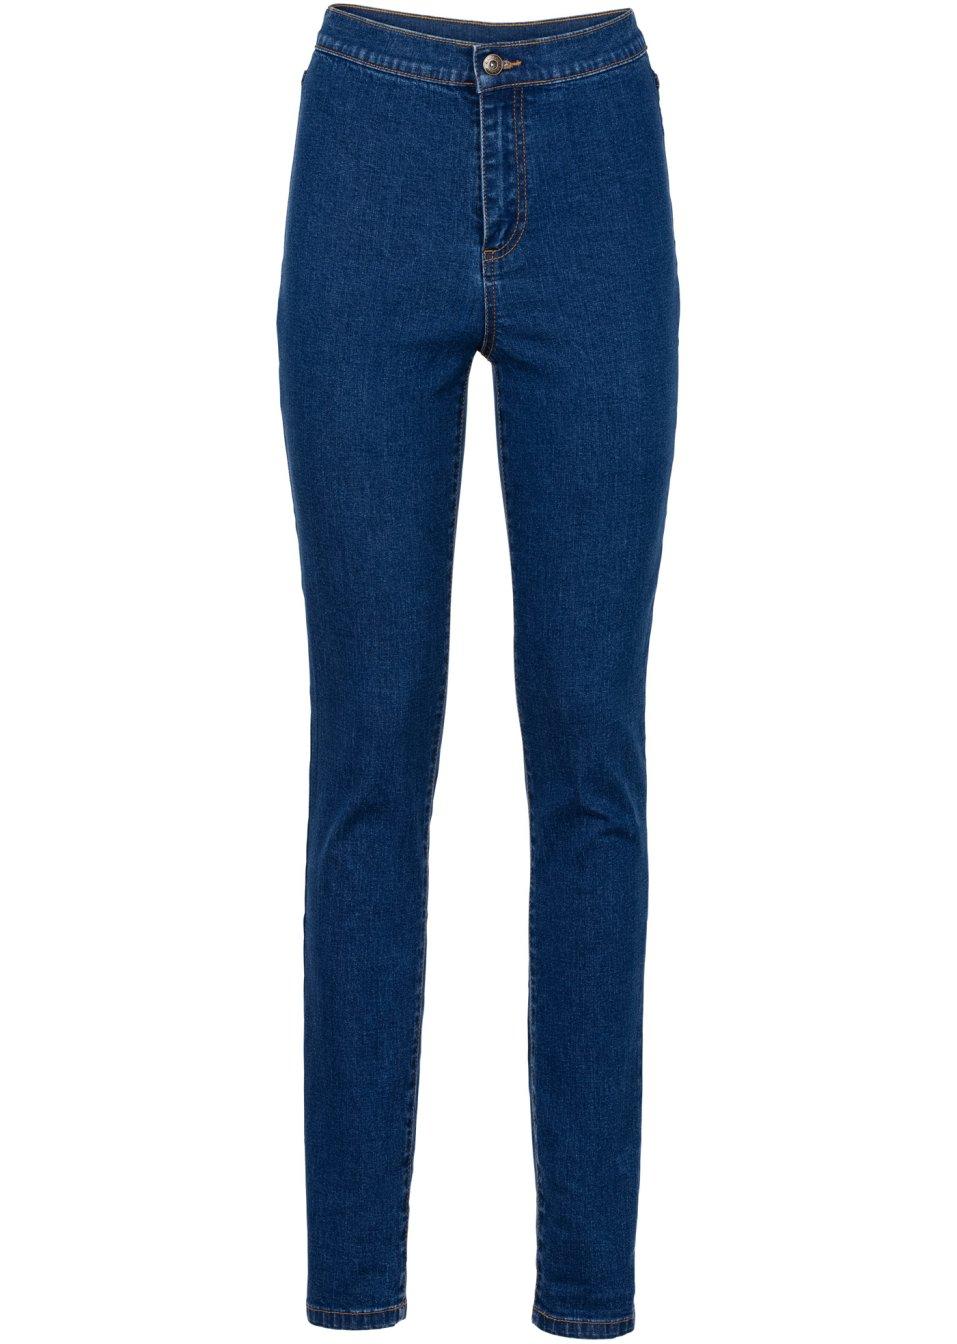 angesagte jeans mit hoher taille blue stone. Black Bedroom Furniture Sets. Home Design Ideas